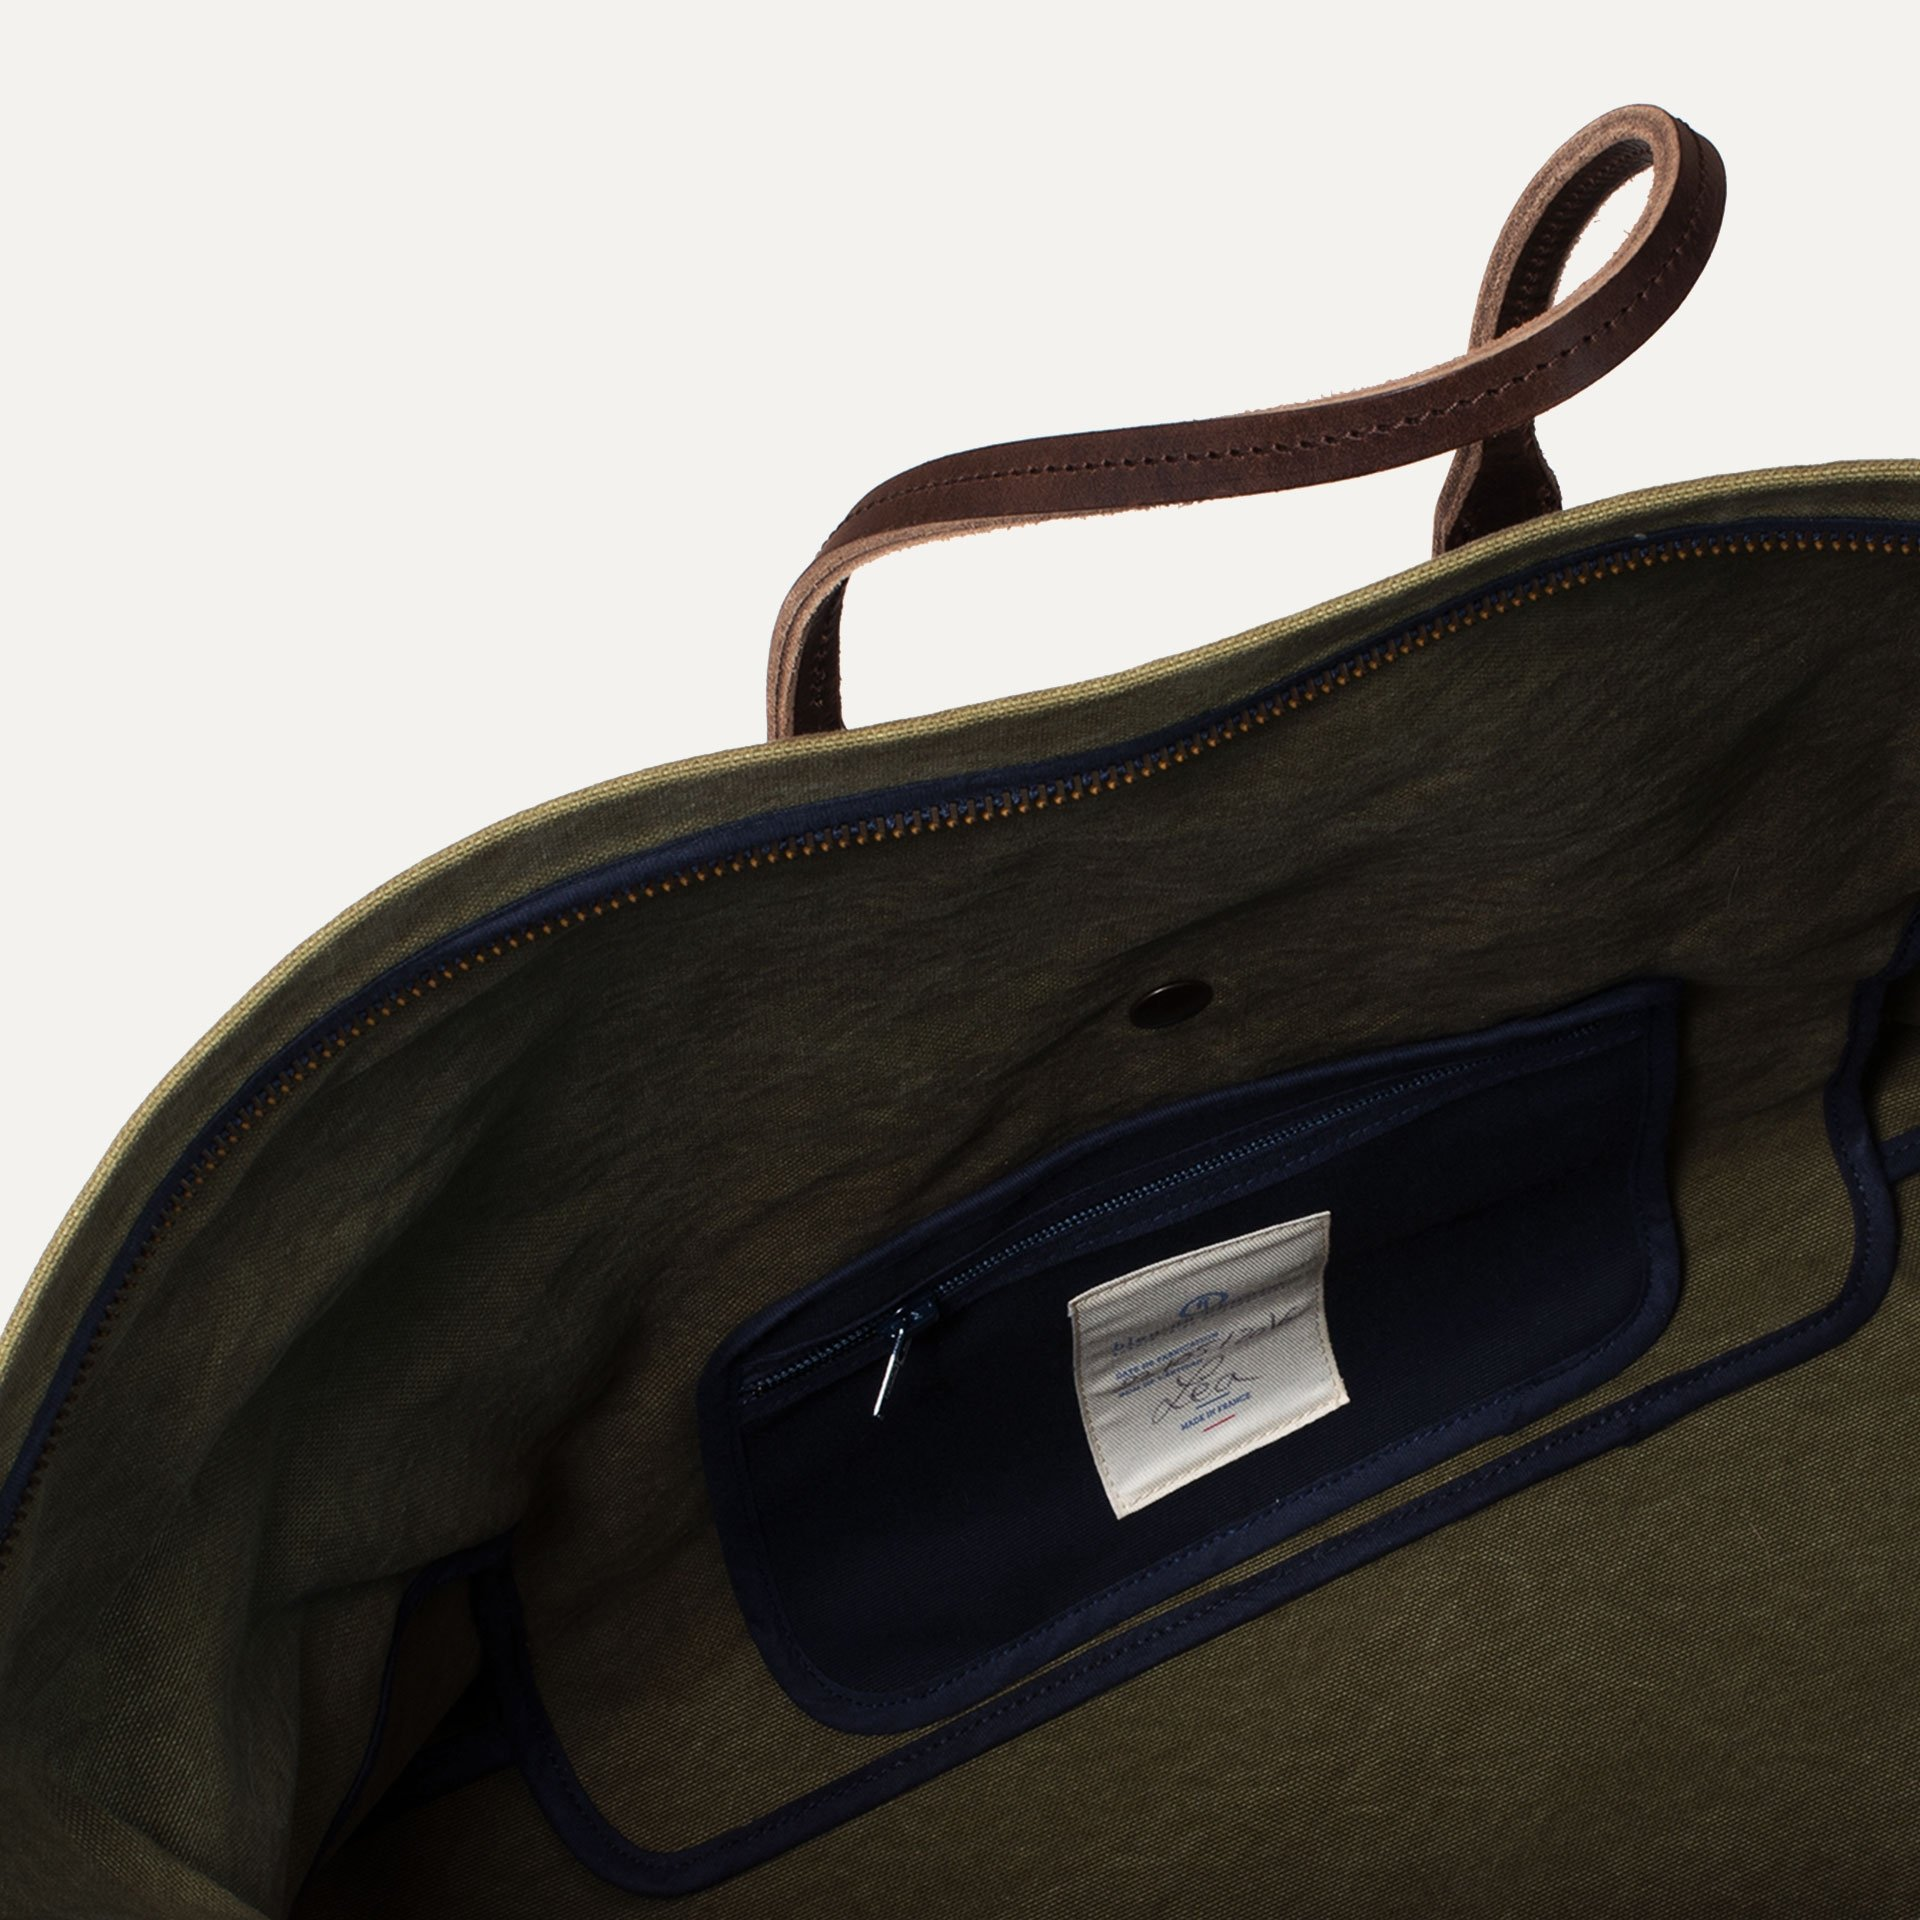 Sac de voyage Cabine - Kaki foncé (image n°4)